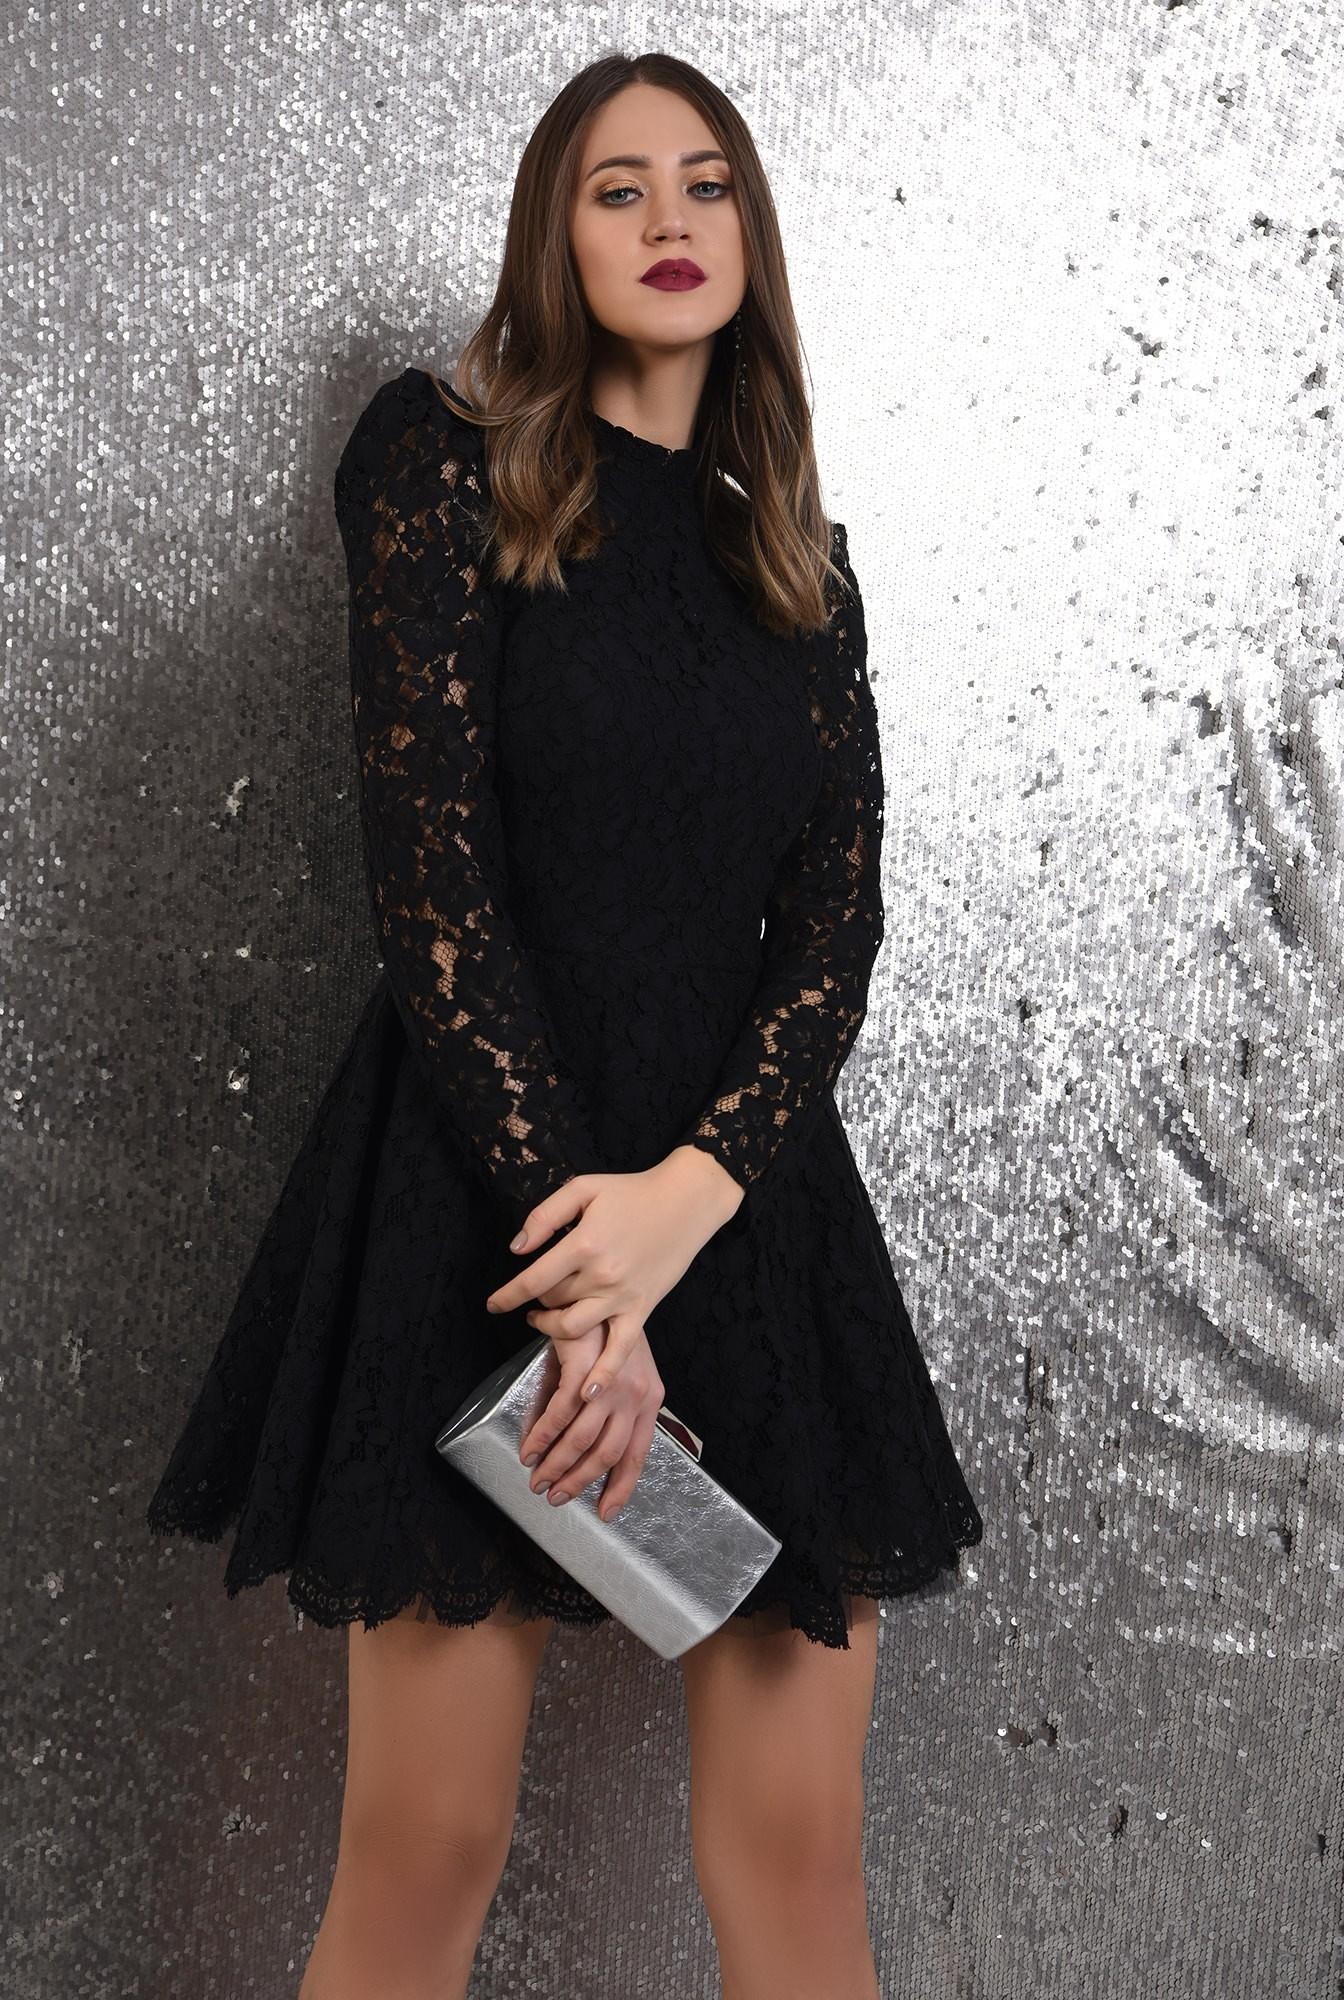 0 - rochie eleganta, din dantela neagra, Poema, cu tul, rochie de ocazie